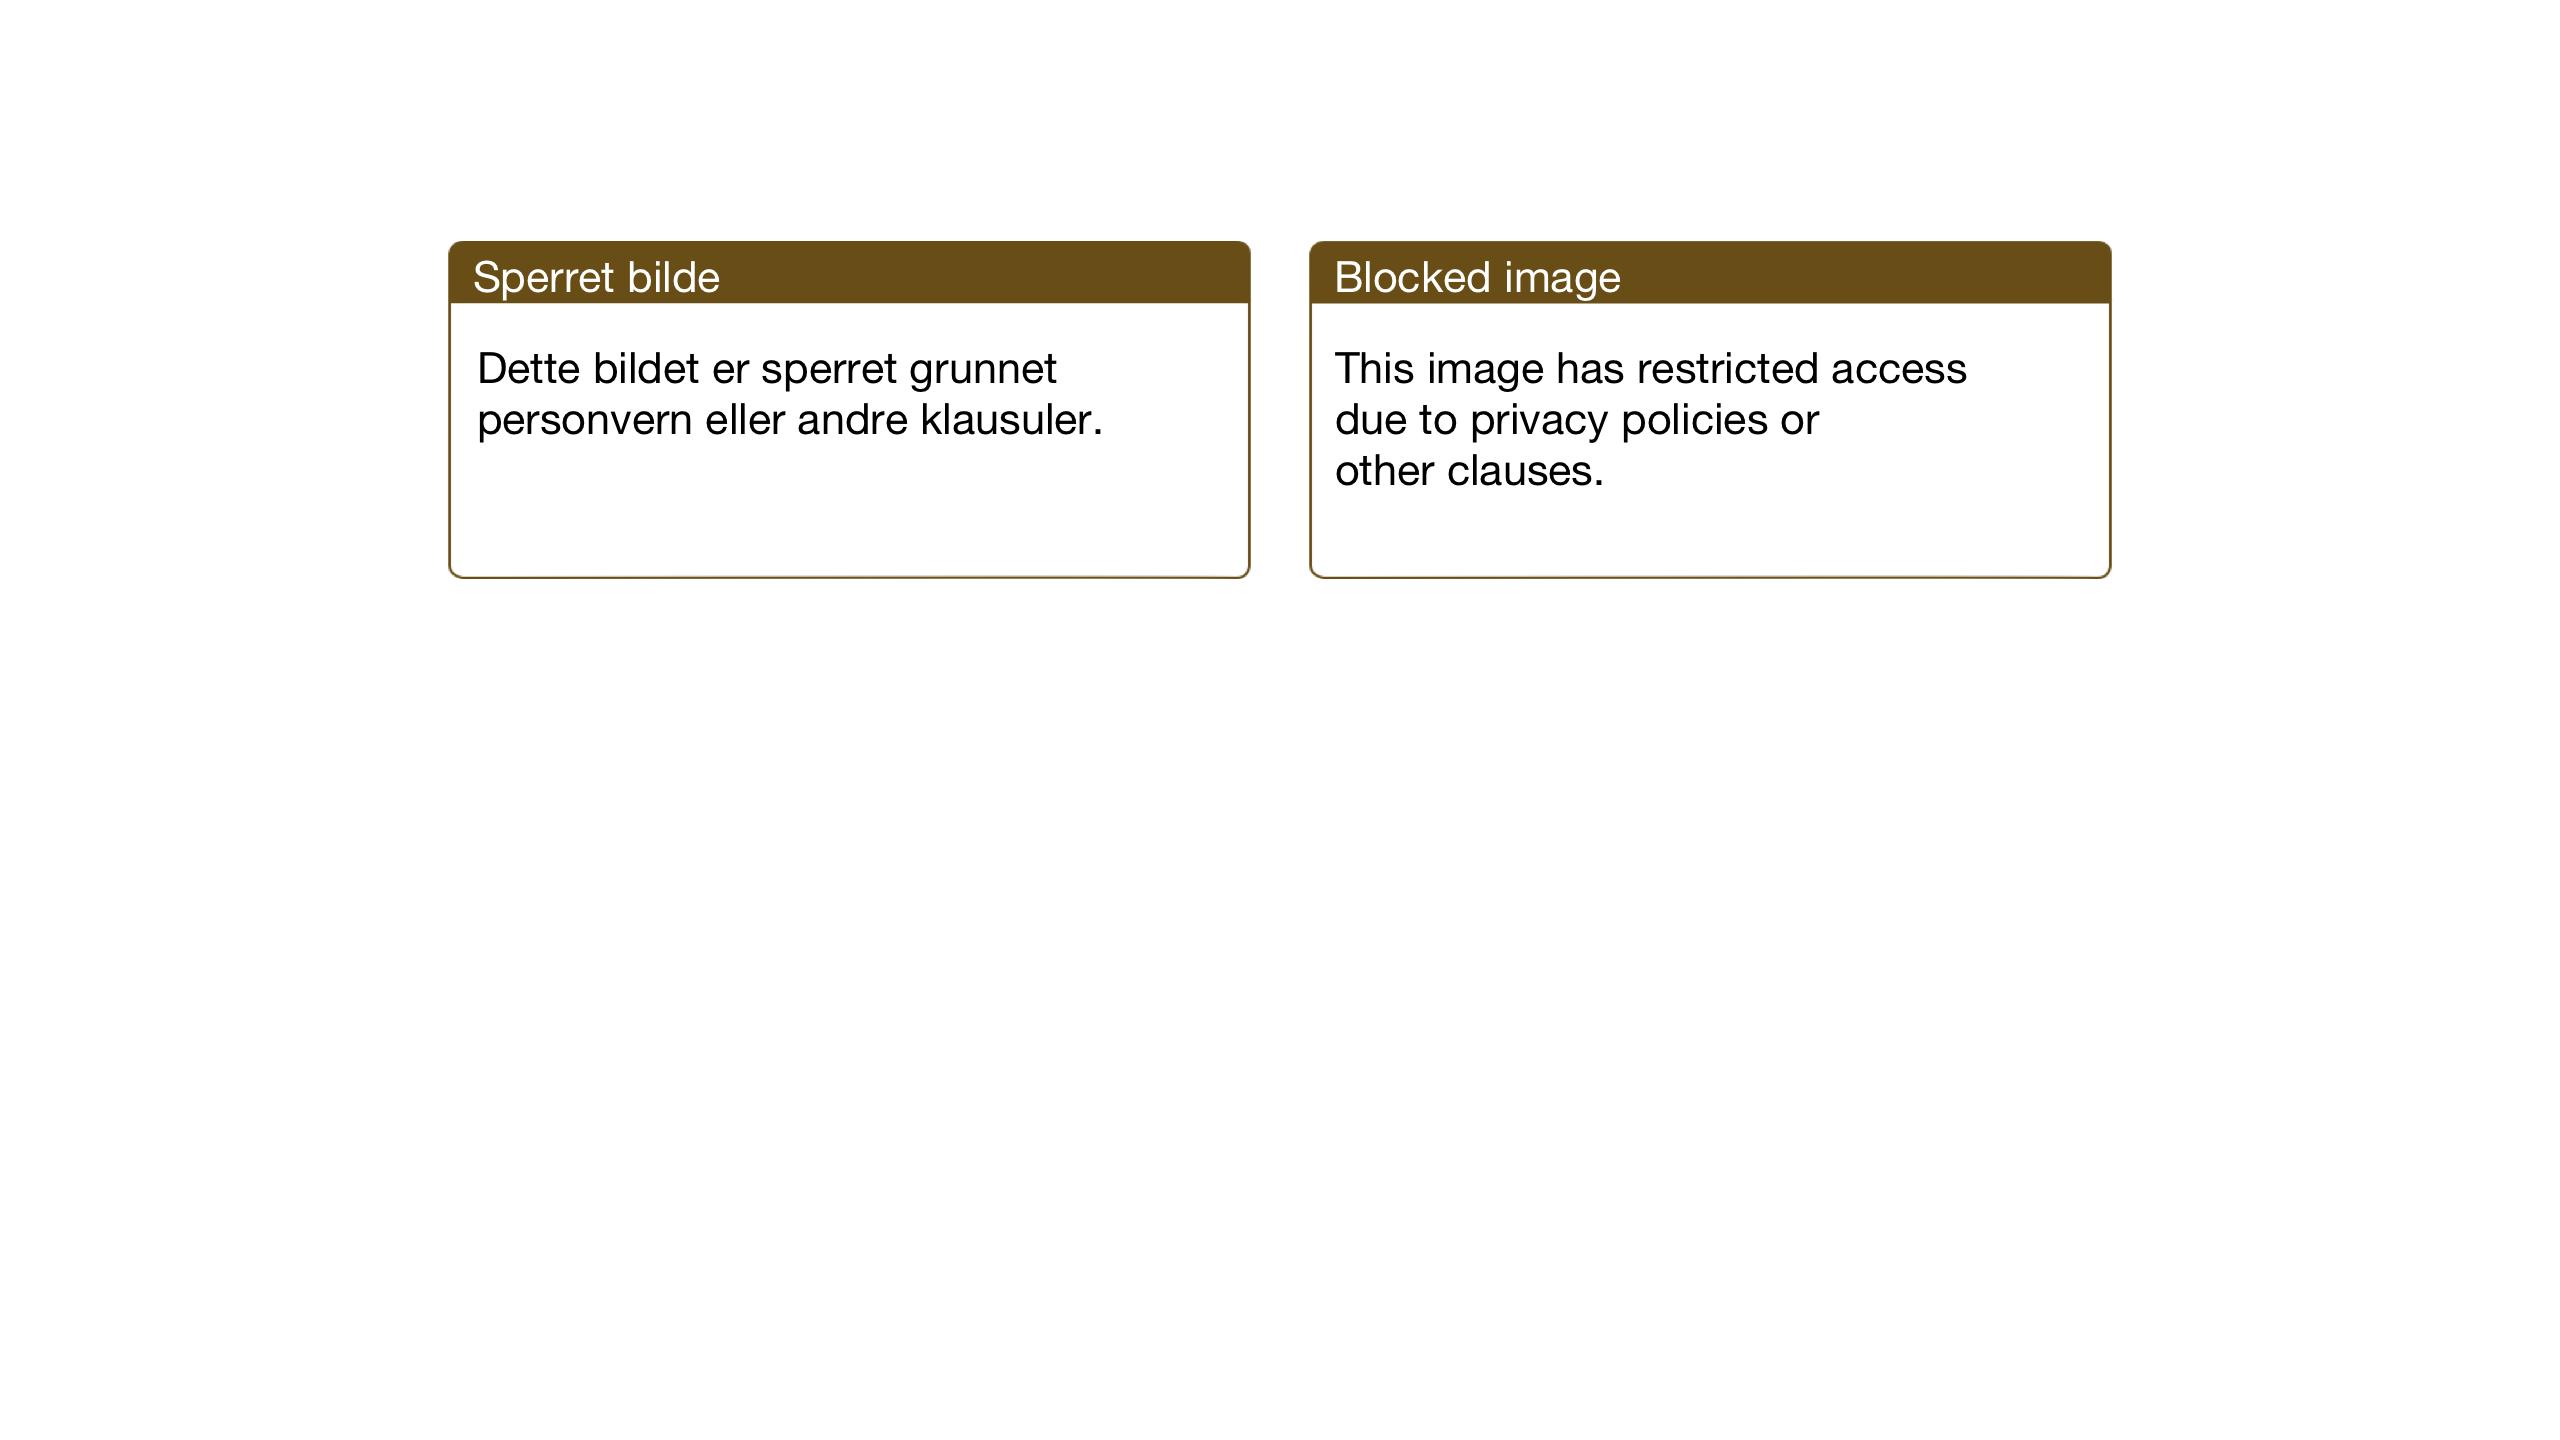 SAH, Vardal prestekontor, H/Ha/Haa/L0018: Ministerialbok nr. 18, 1930-1945, s. 45